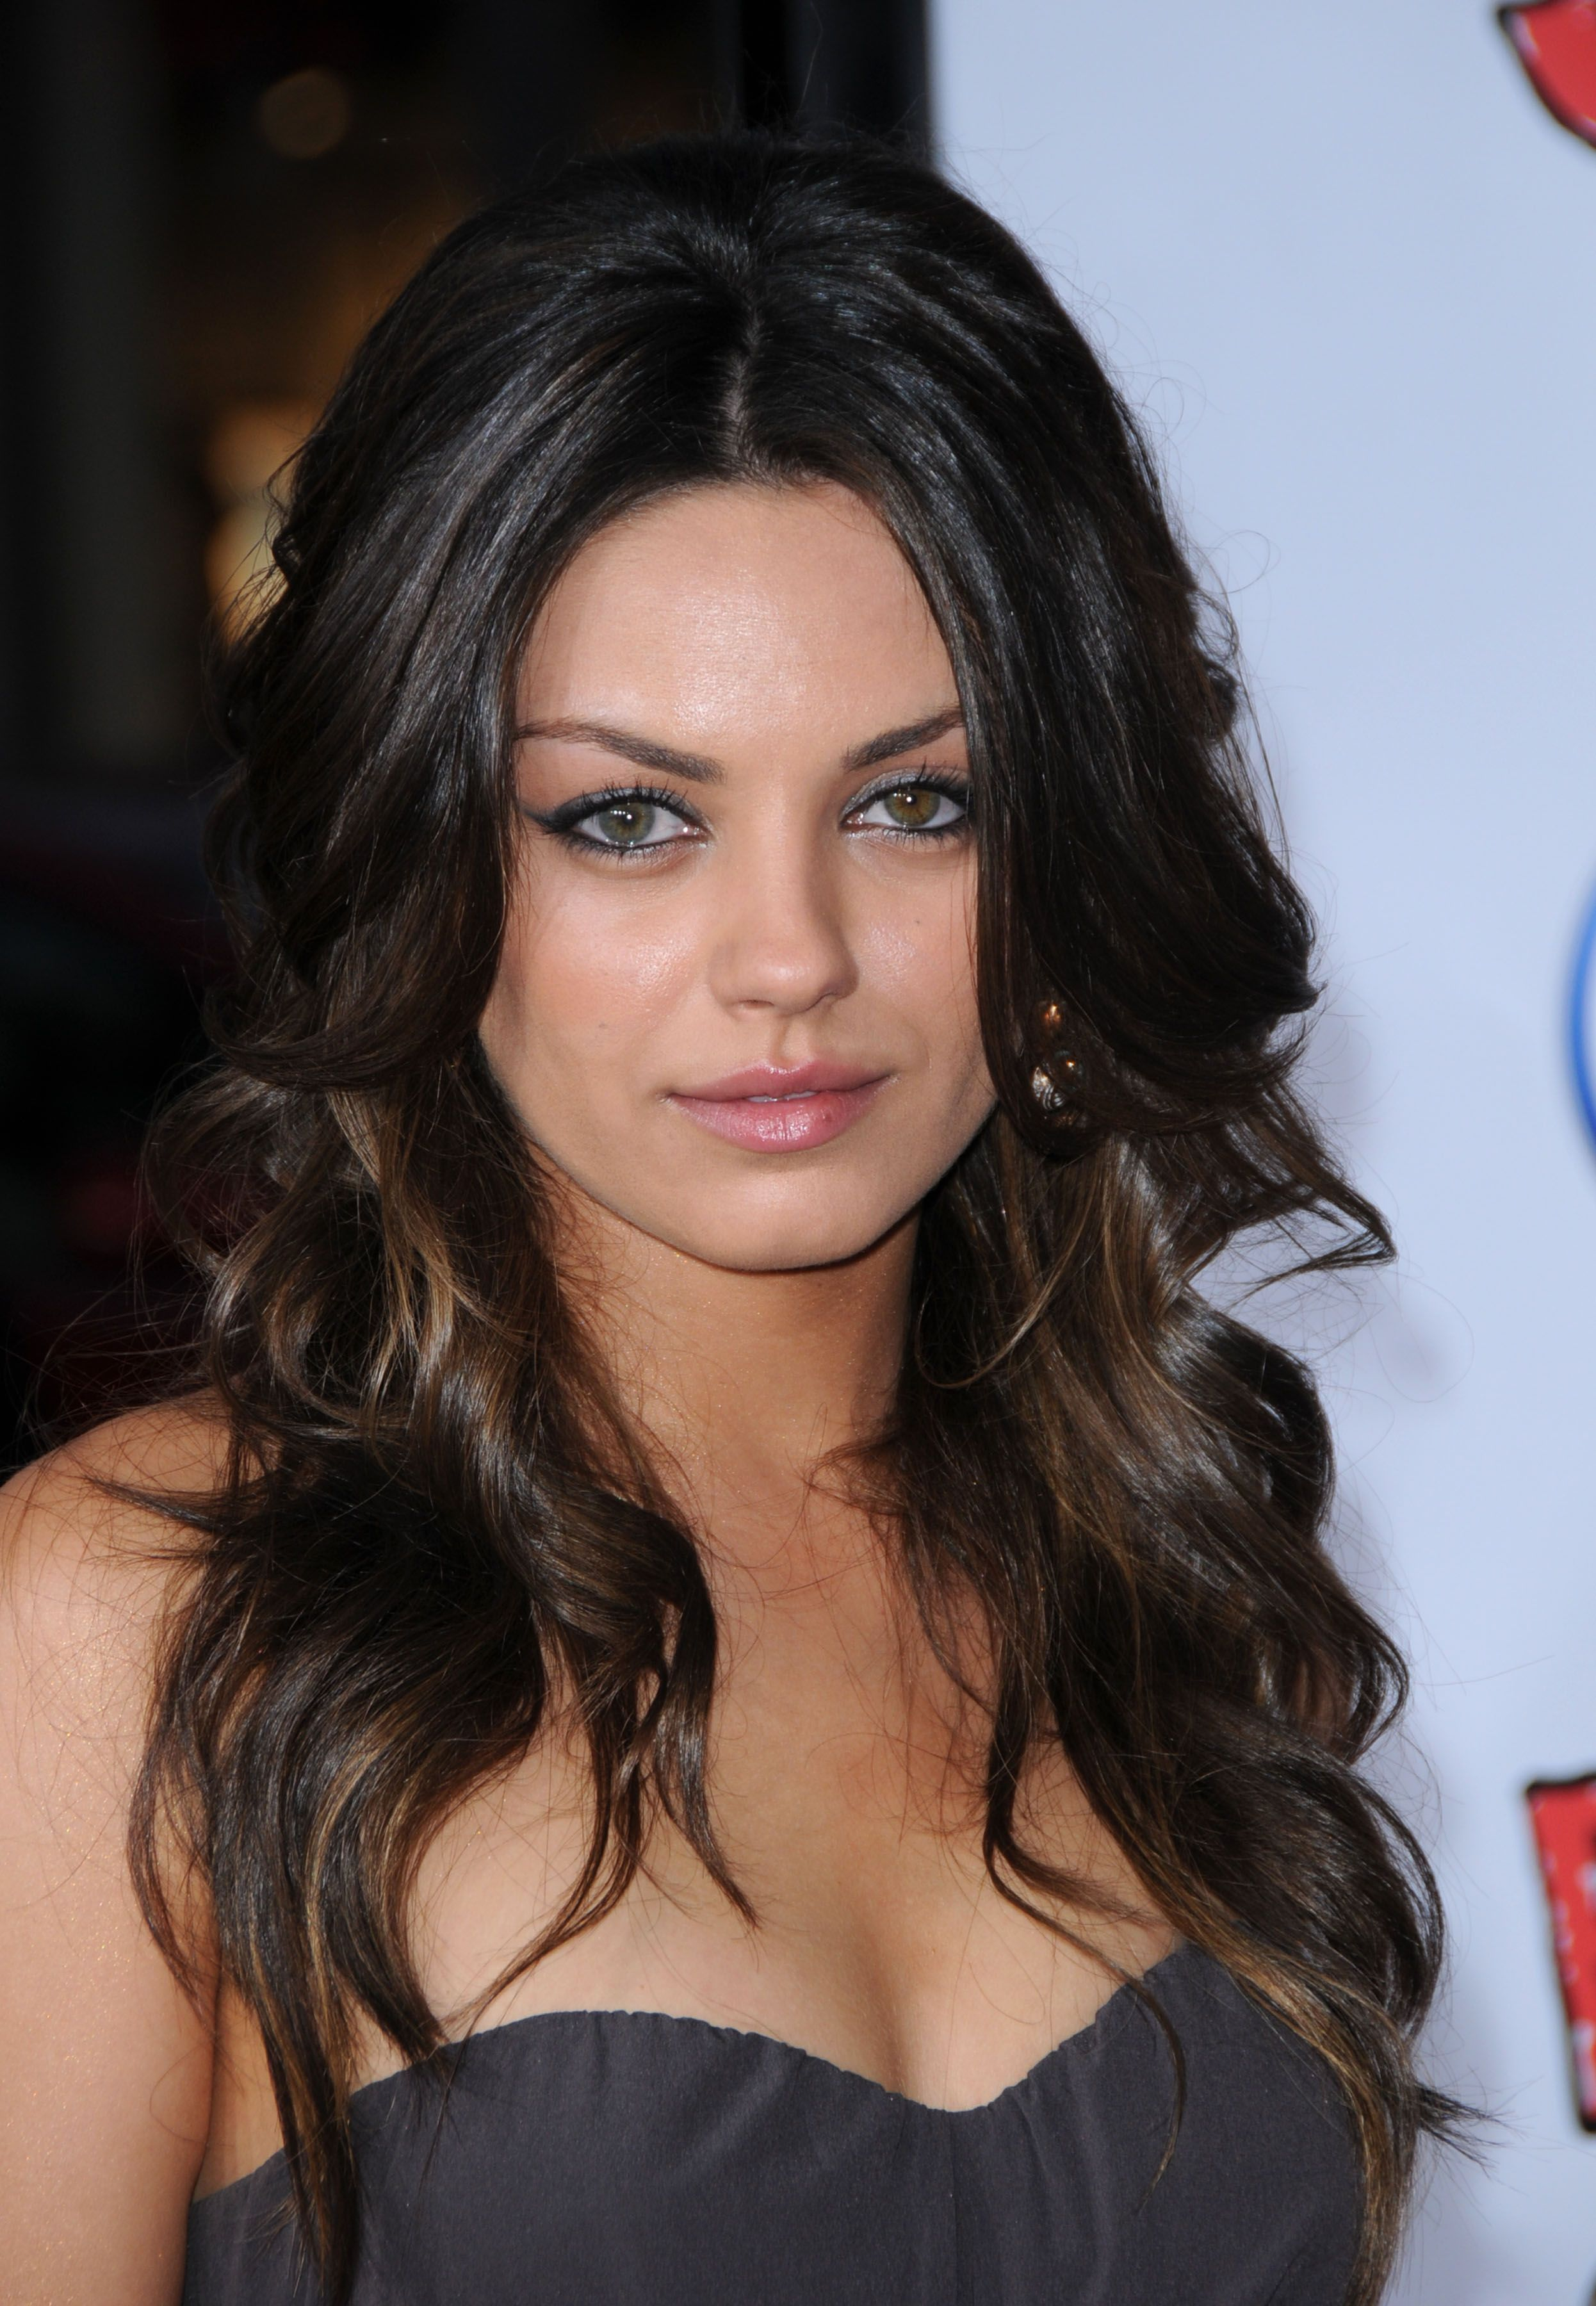 Mila Kunis Premiere Forgetting Sarah Marshall In La